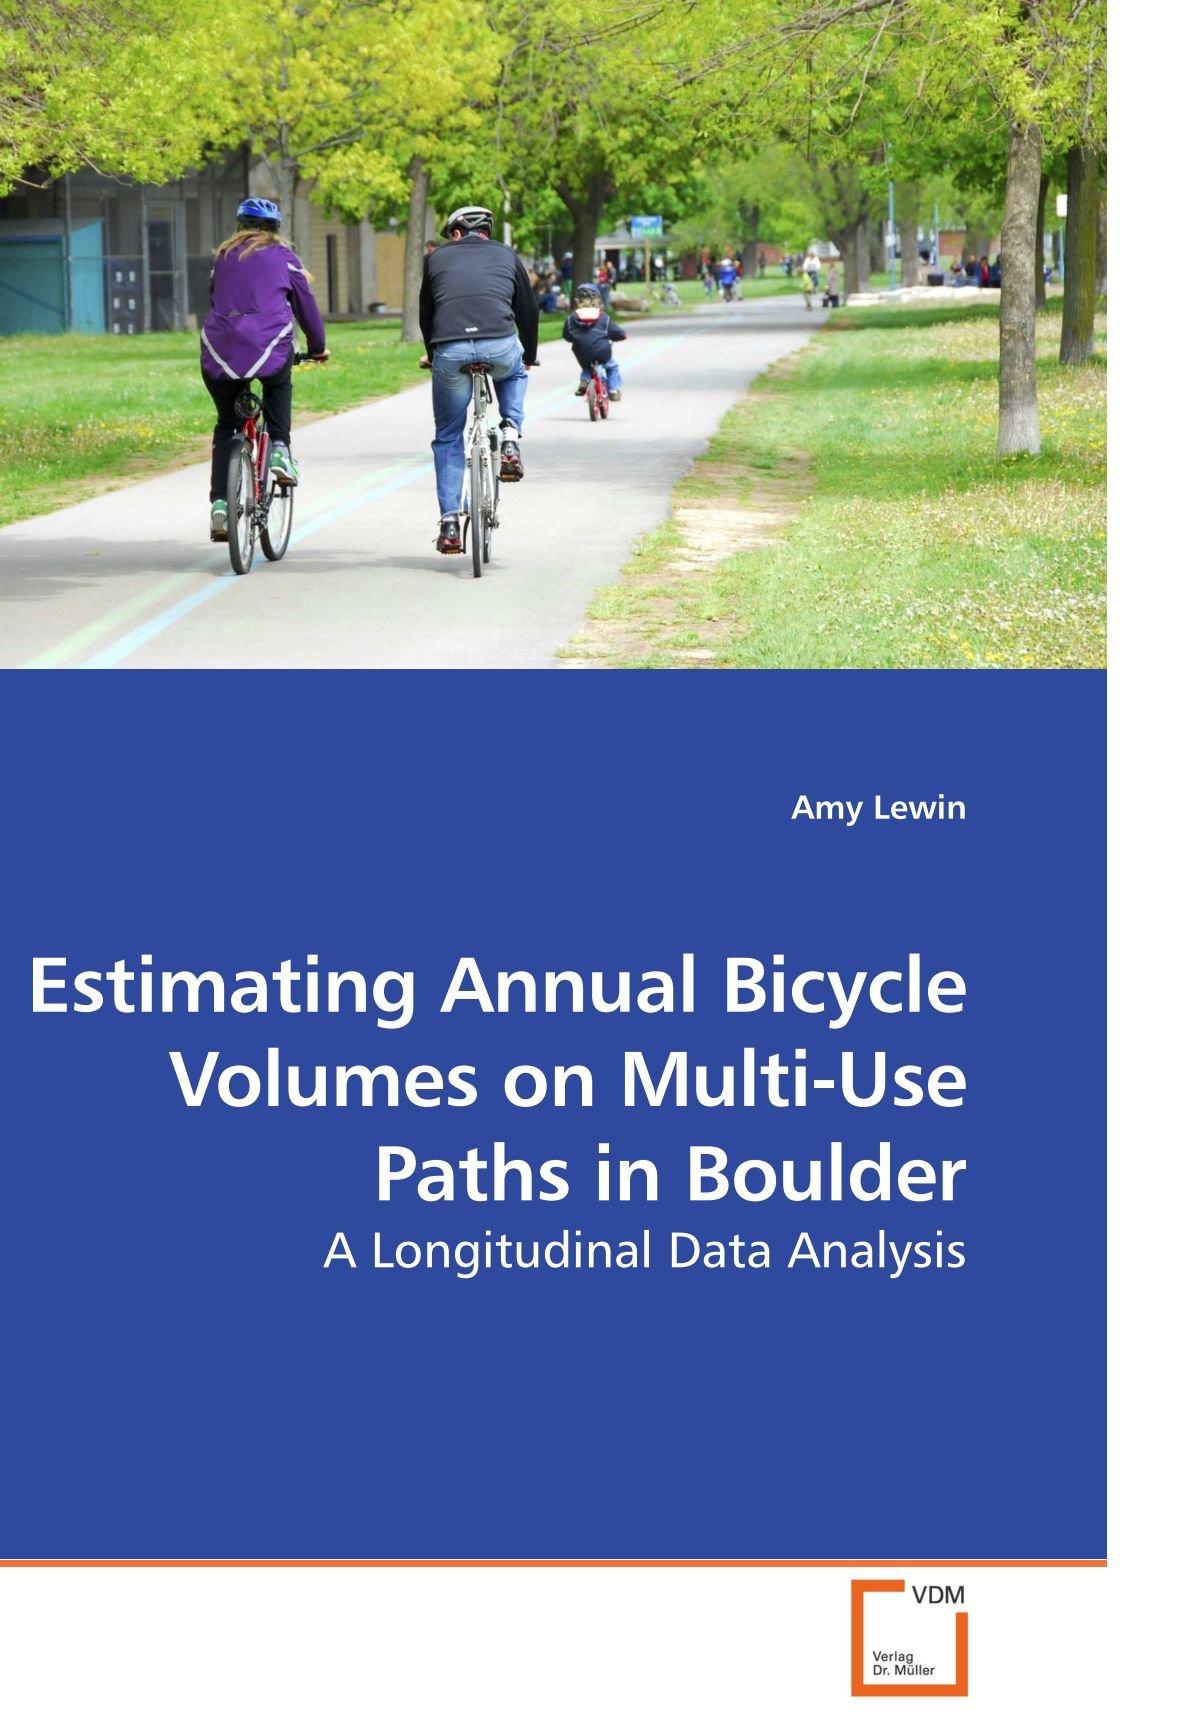 Estimating Annual Bicycle Volumes on Multi-Use Paths in Boulder: A Longitudinal Data Analysis PDF